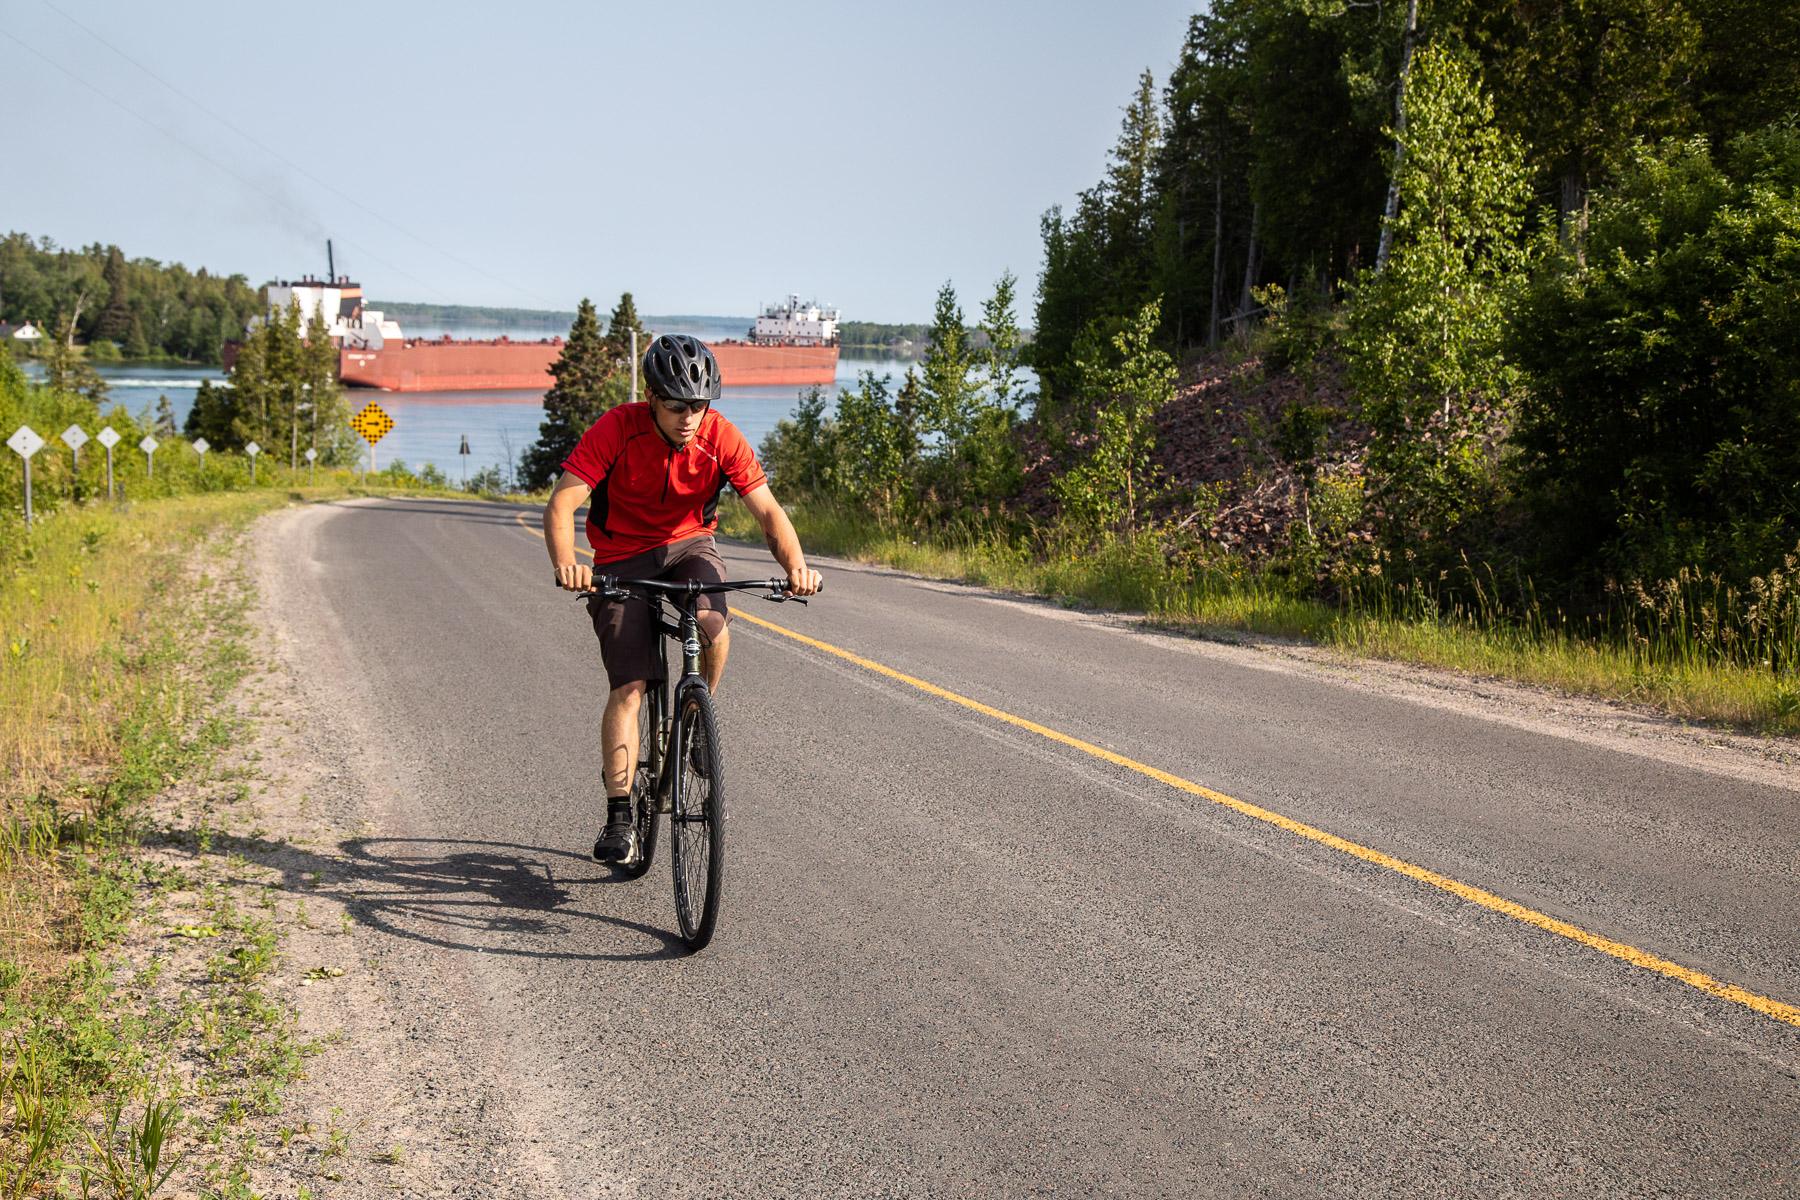 Island Cruising - CYCLING ALGOMA'S ST. JOSEPH ISLAND